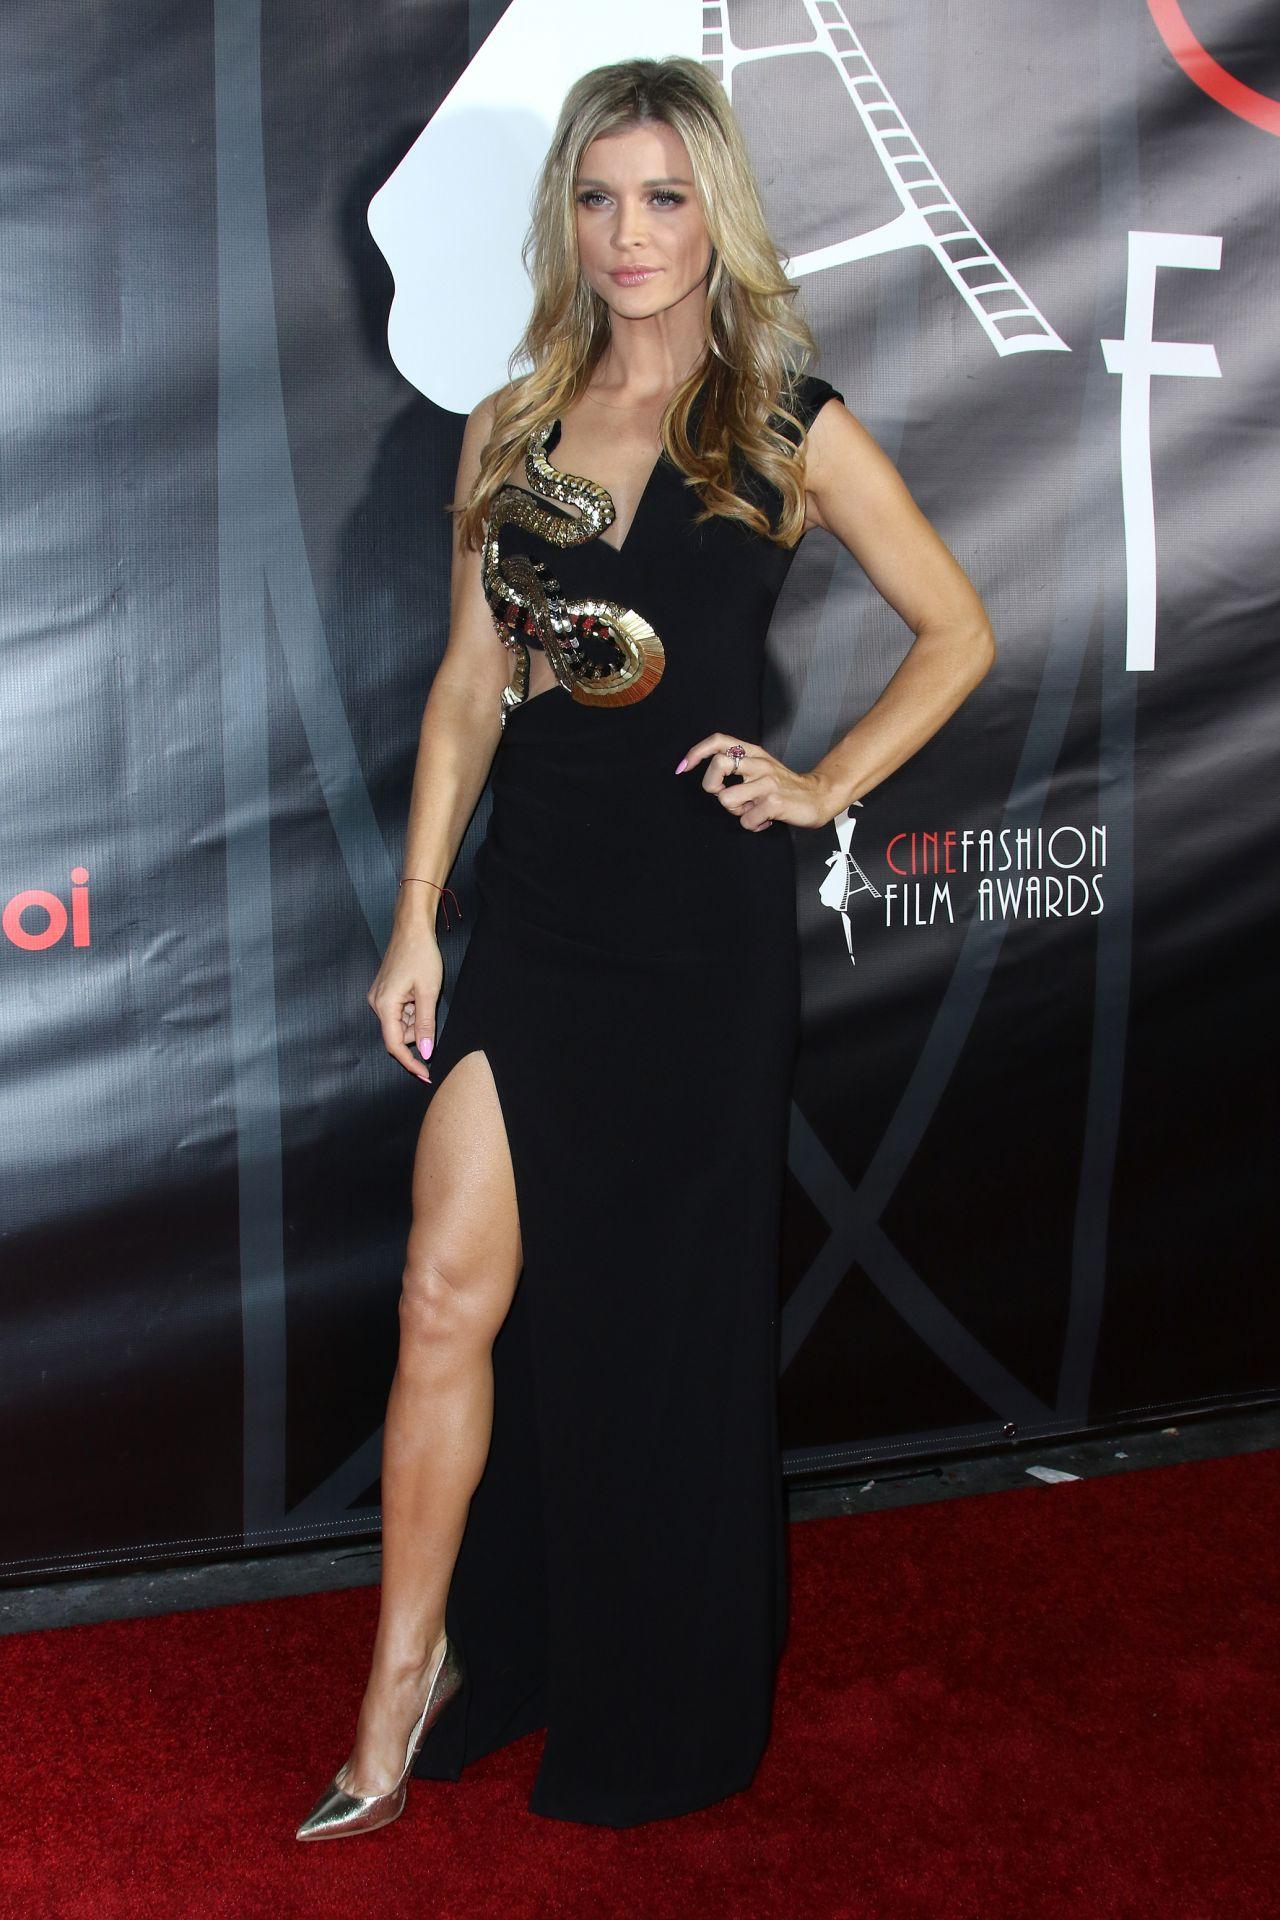 Joanna krupa cinefashion film awards 2019 in los angeles nudes (44 photos), Boobs Celebrites pictures